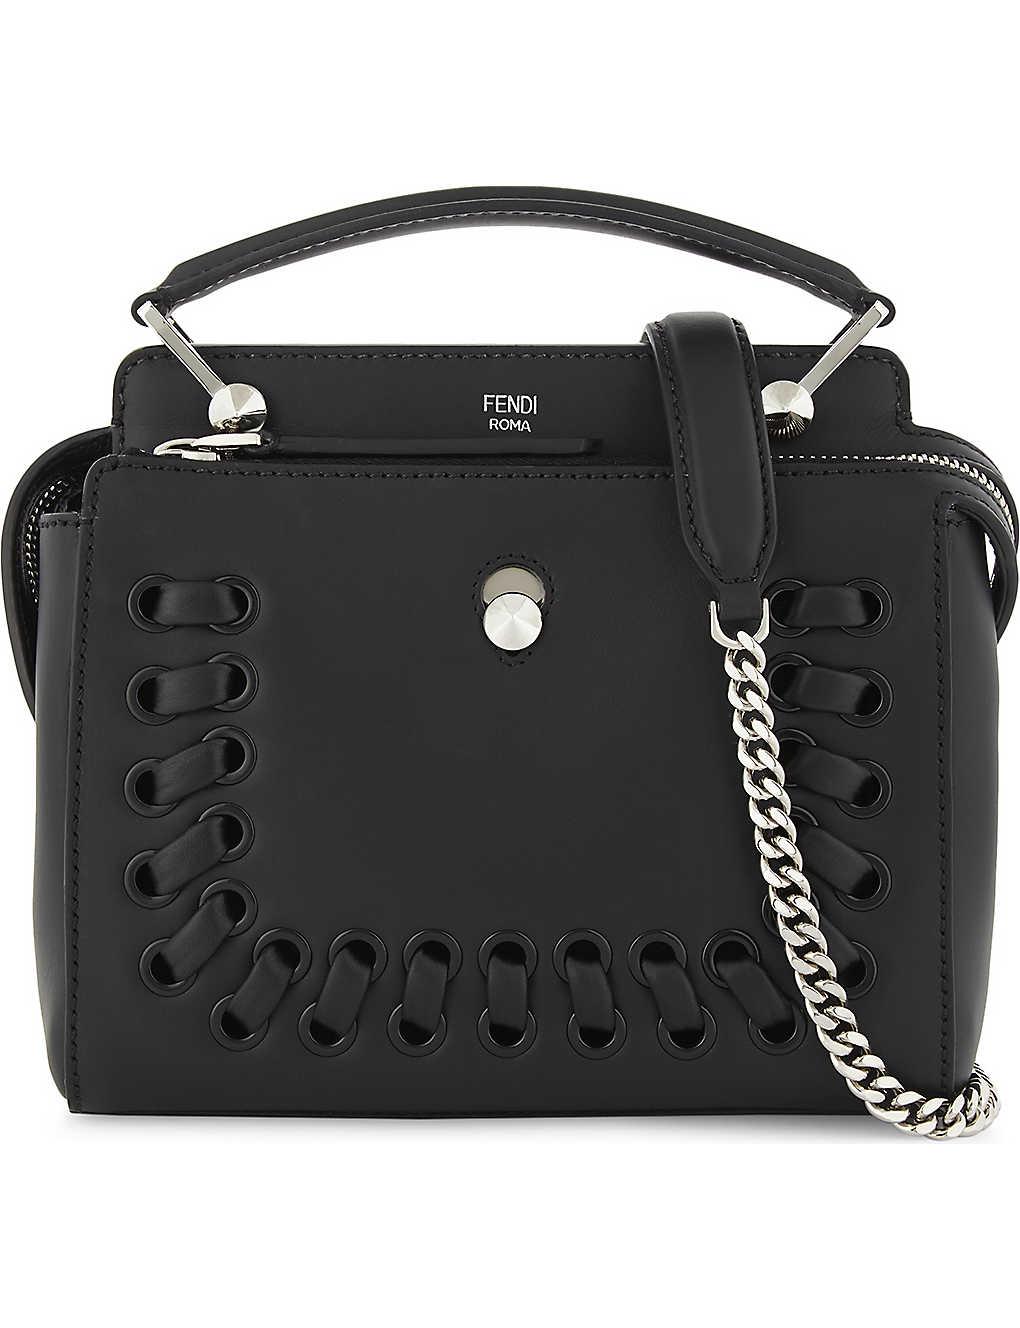 FENDI - Dotcom leather cross-body bag  a0789786b2960